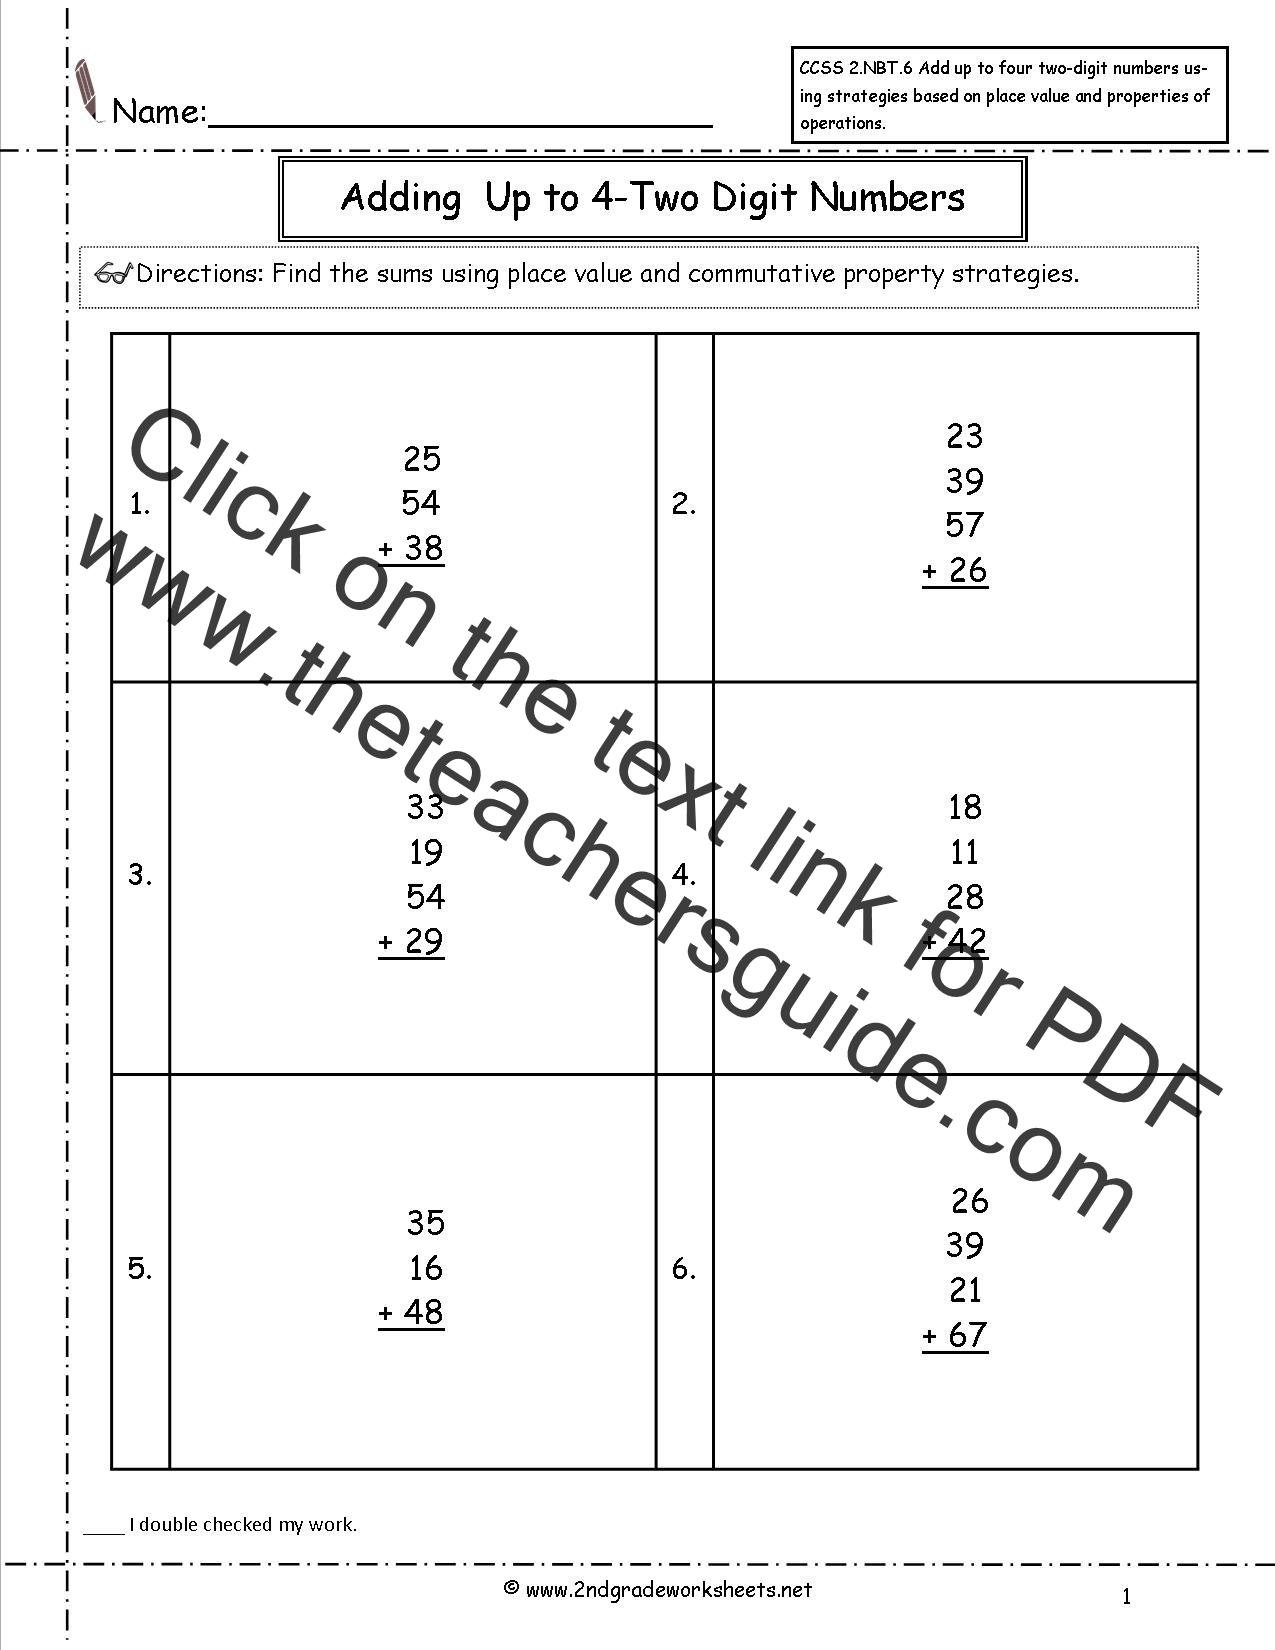 Printables Of 2 Nbt 6 Worksheets